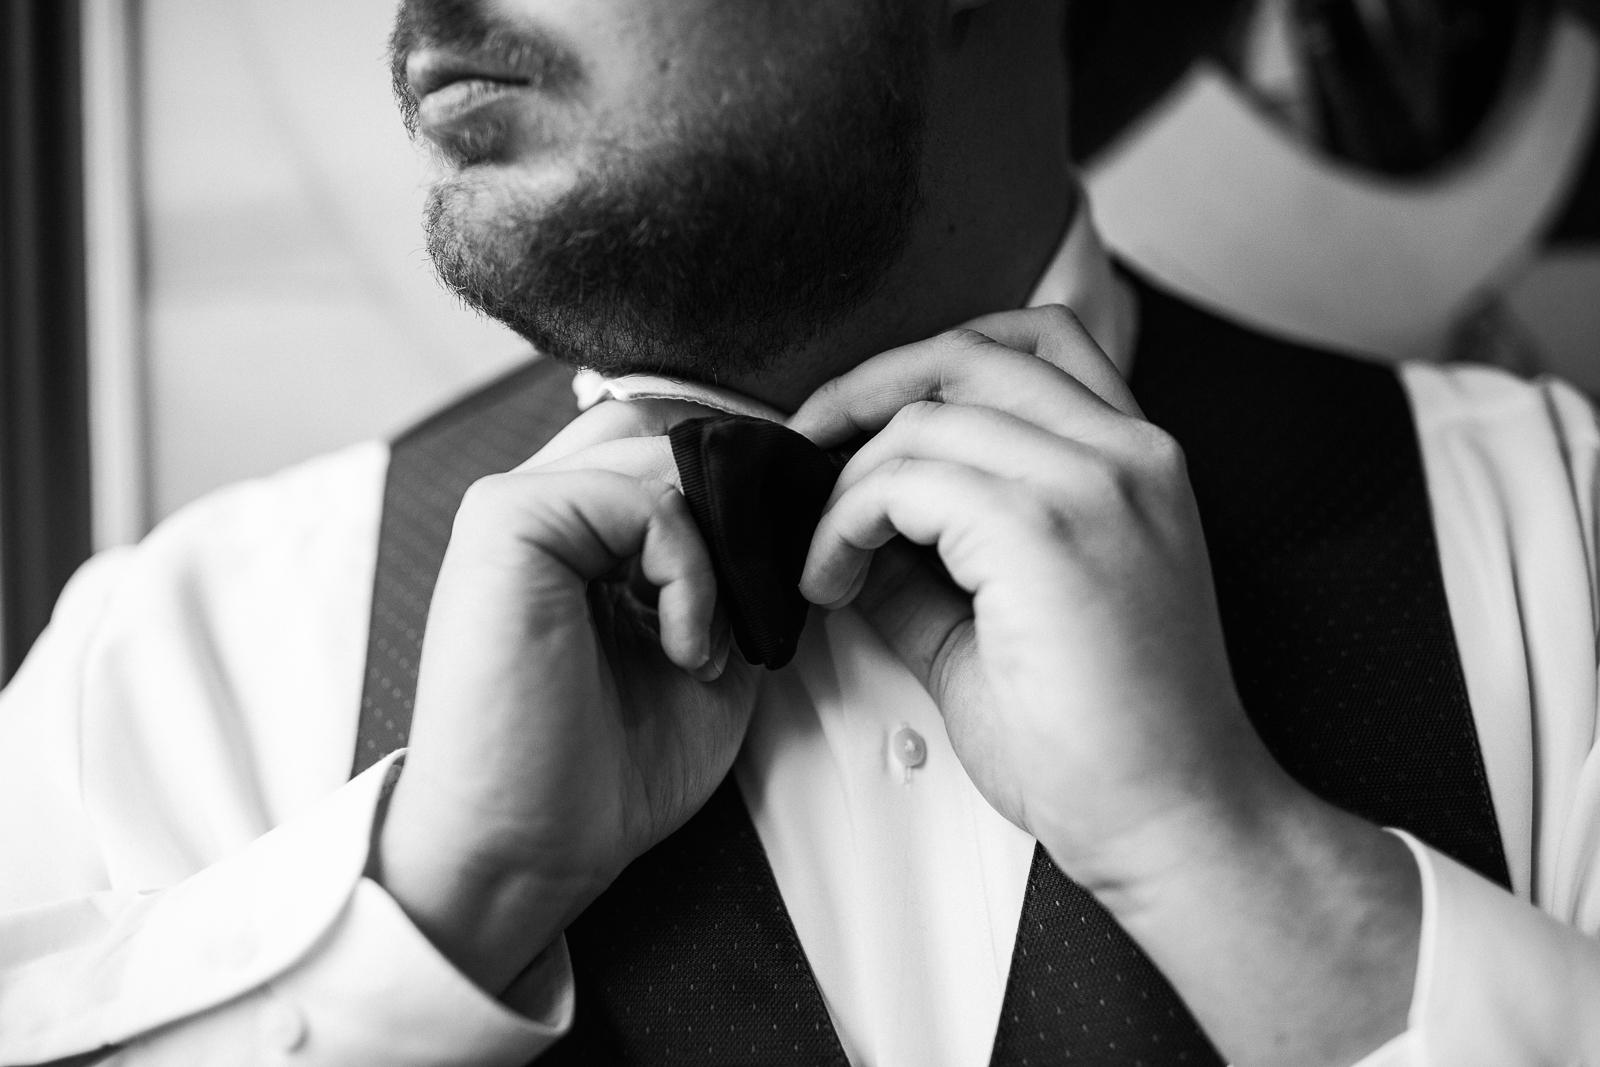 gander-wedding-photographer-7.jpg